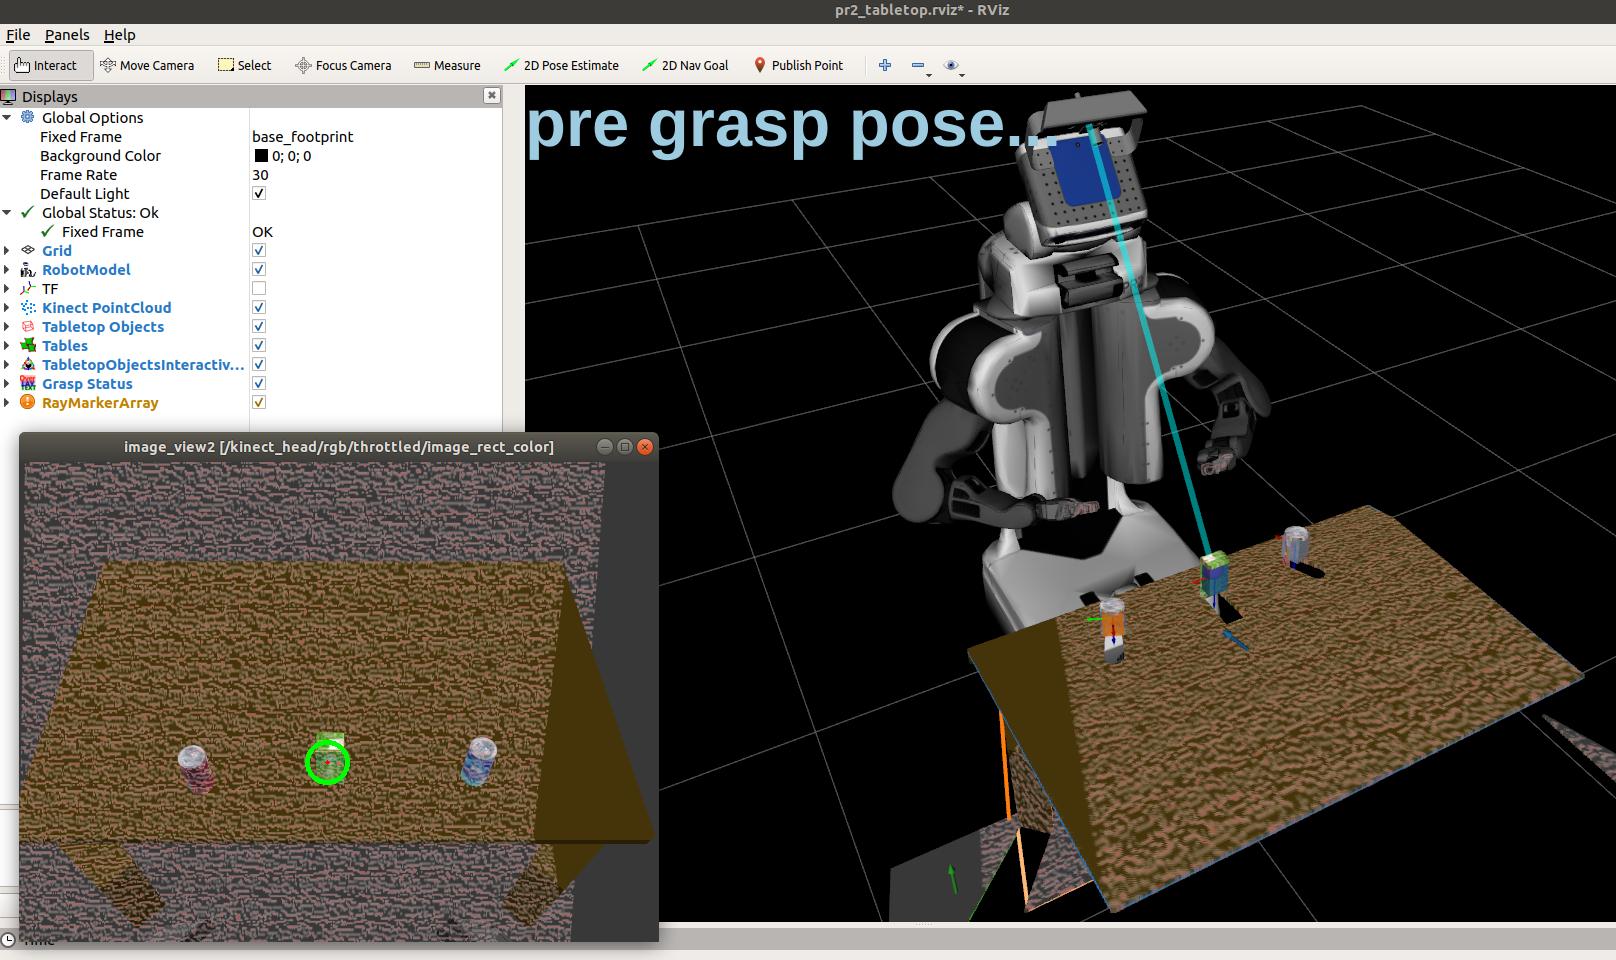 pr2_interactive